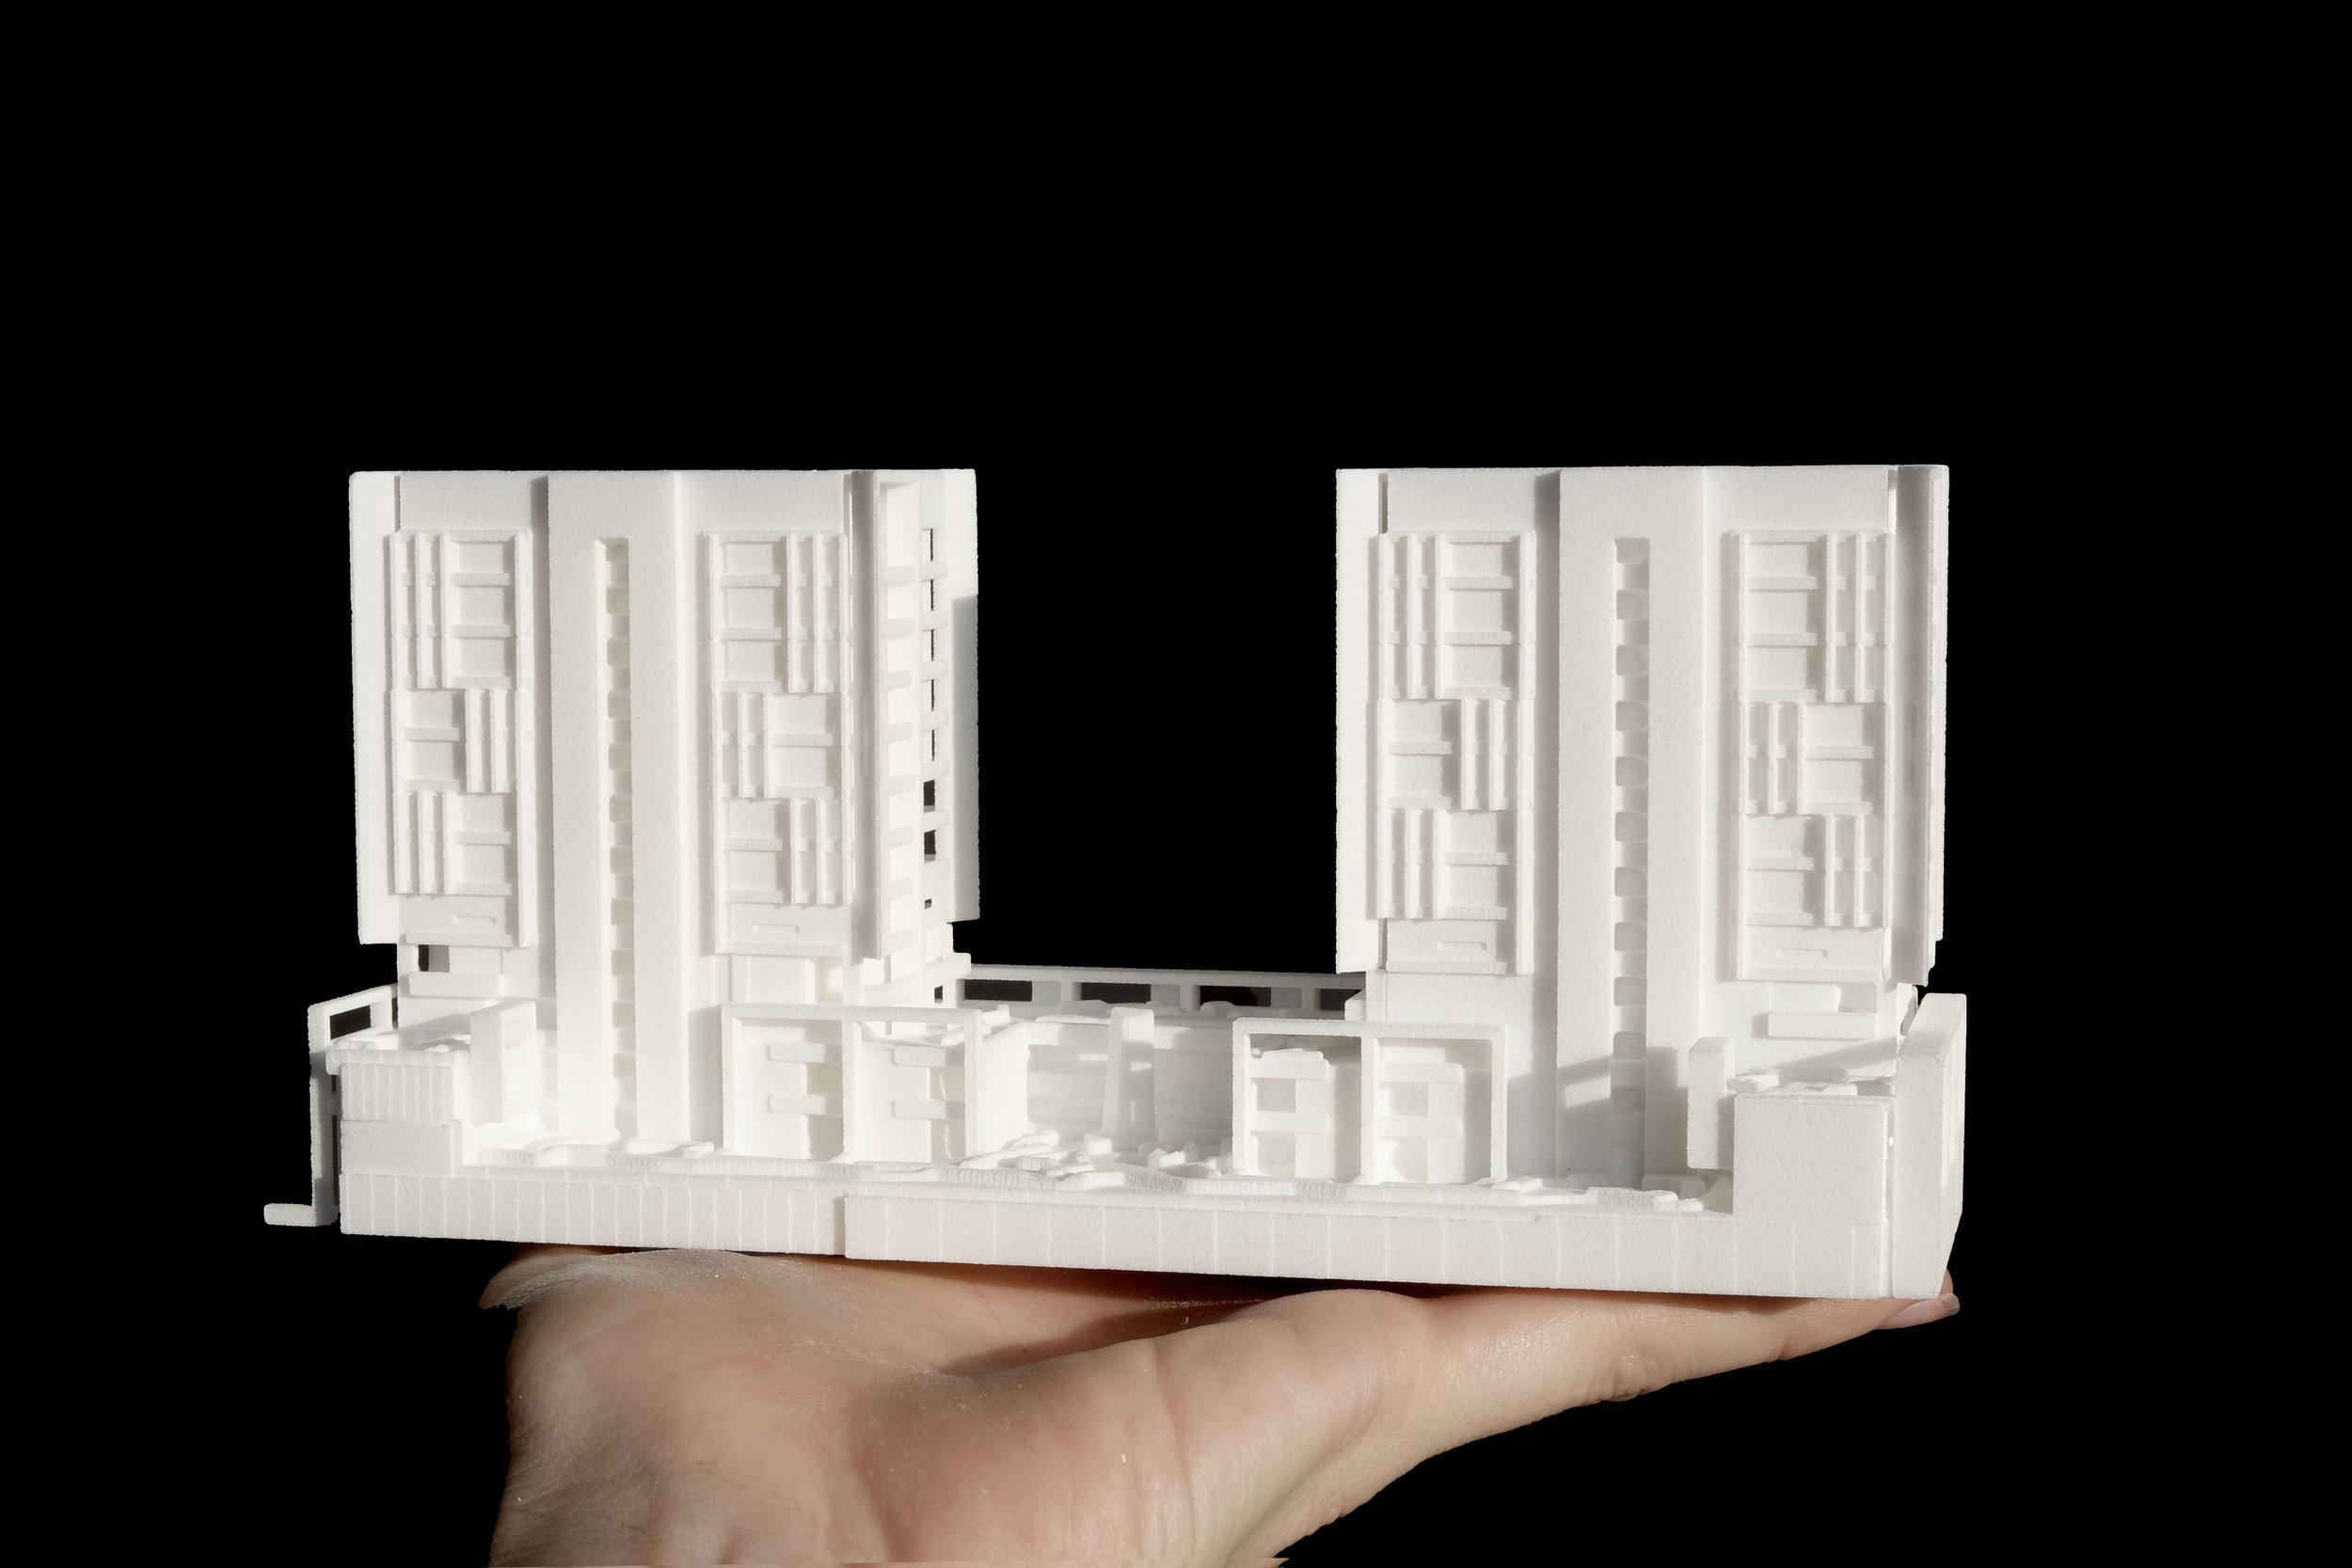 Make_models_Sydney_3D_print_scale_architecture2.jpg